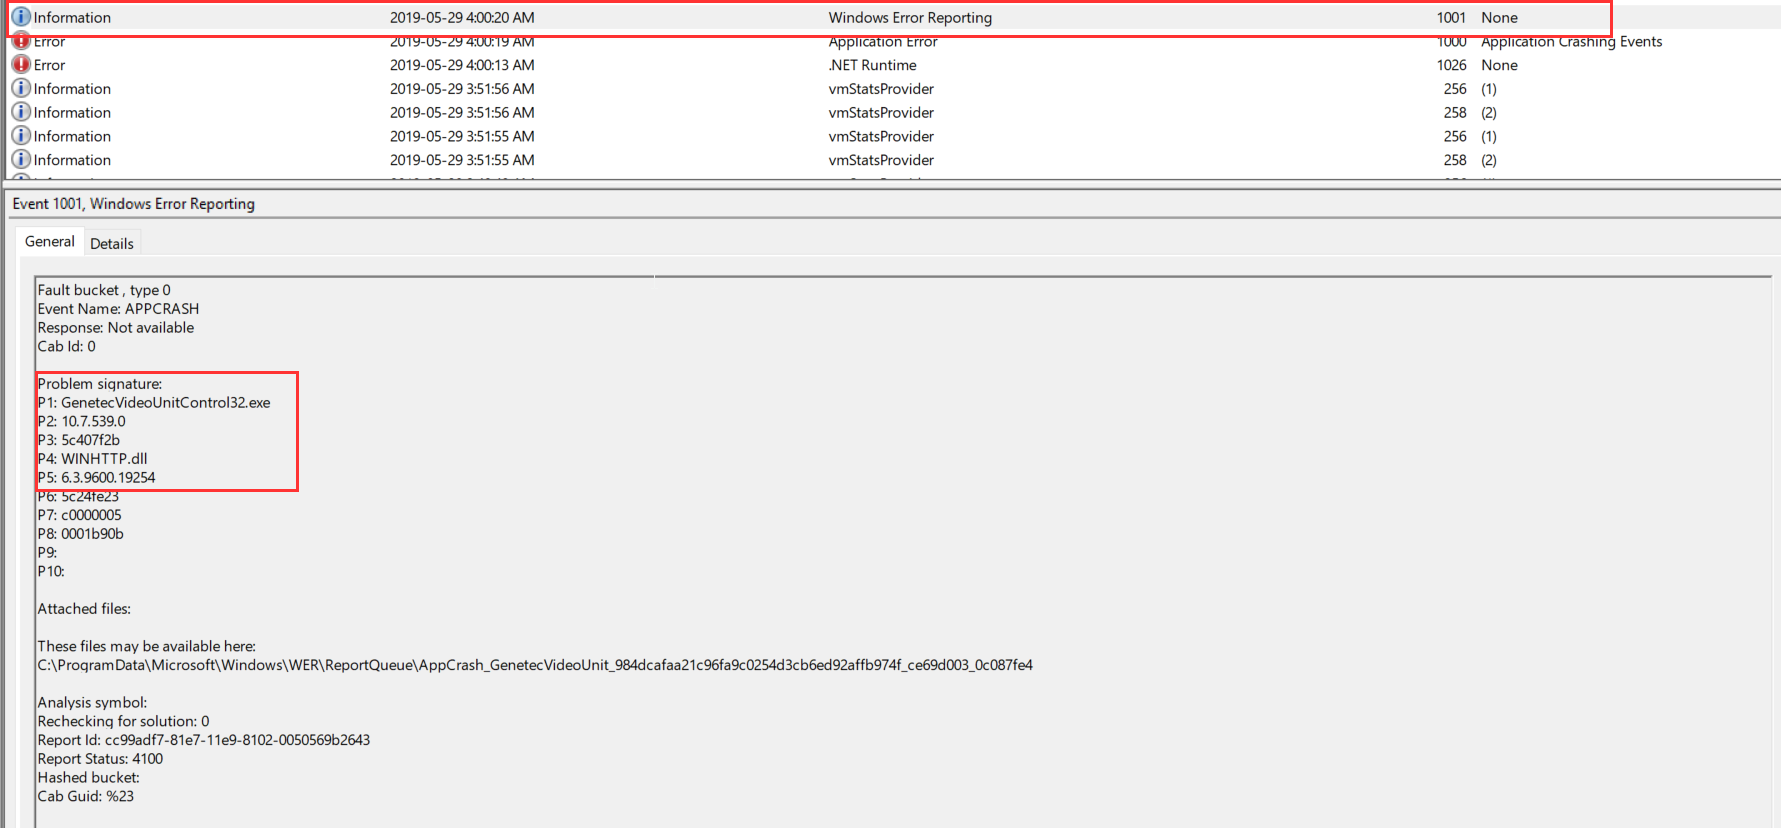 d3dx9_30.dll download for windows 7 64 bit